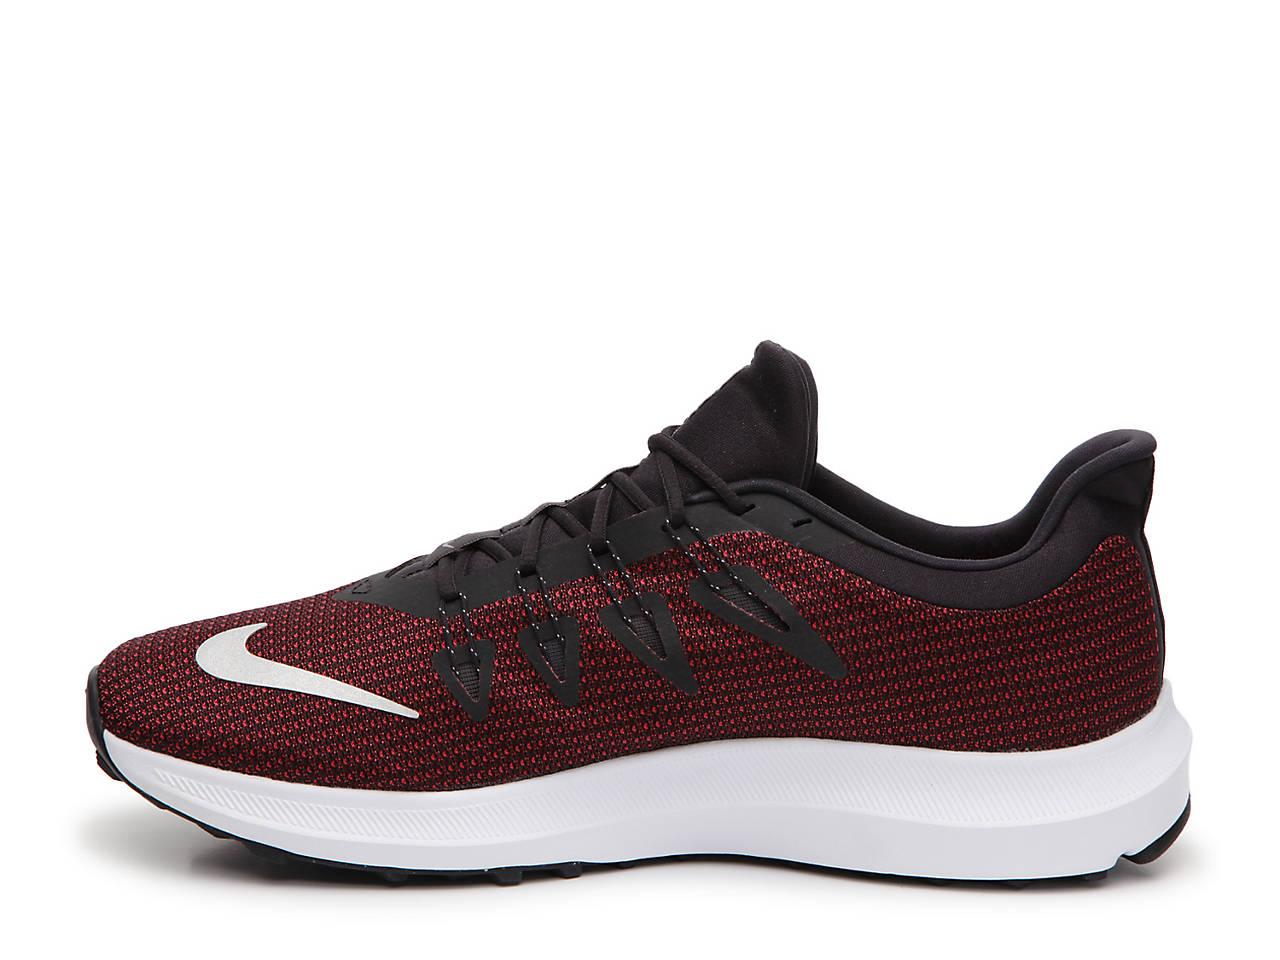 Nike Quest Lightweight Running Shoe - Men's Men's Shoes | DSW